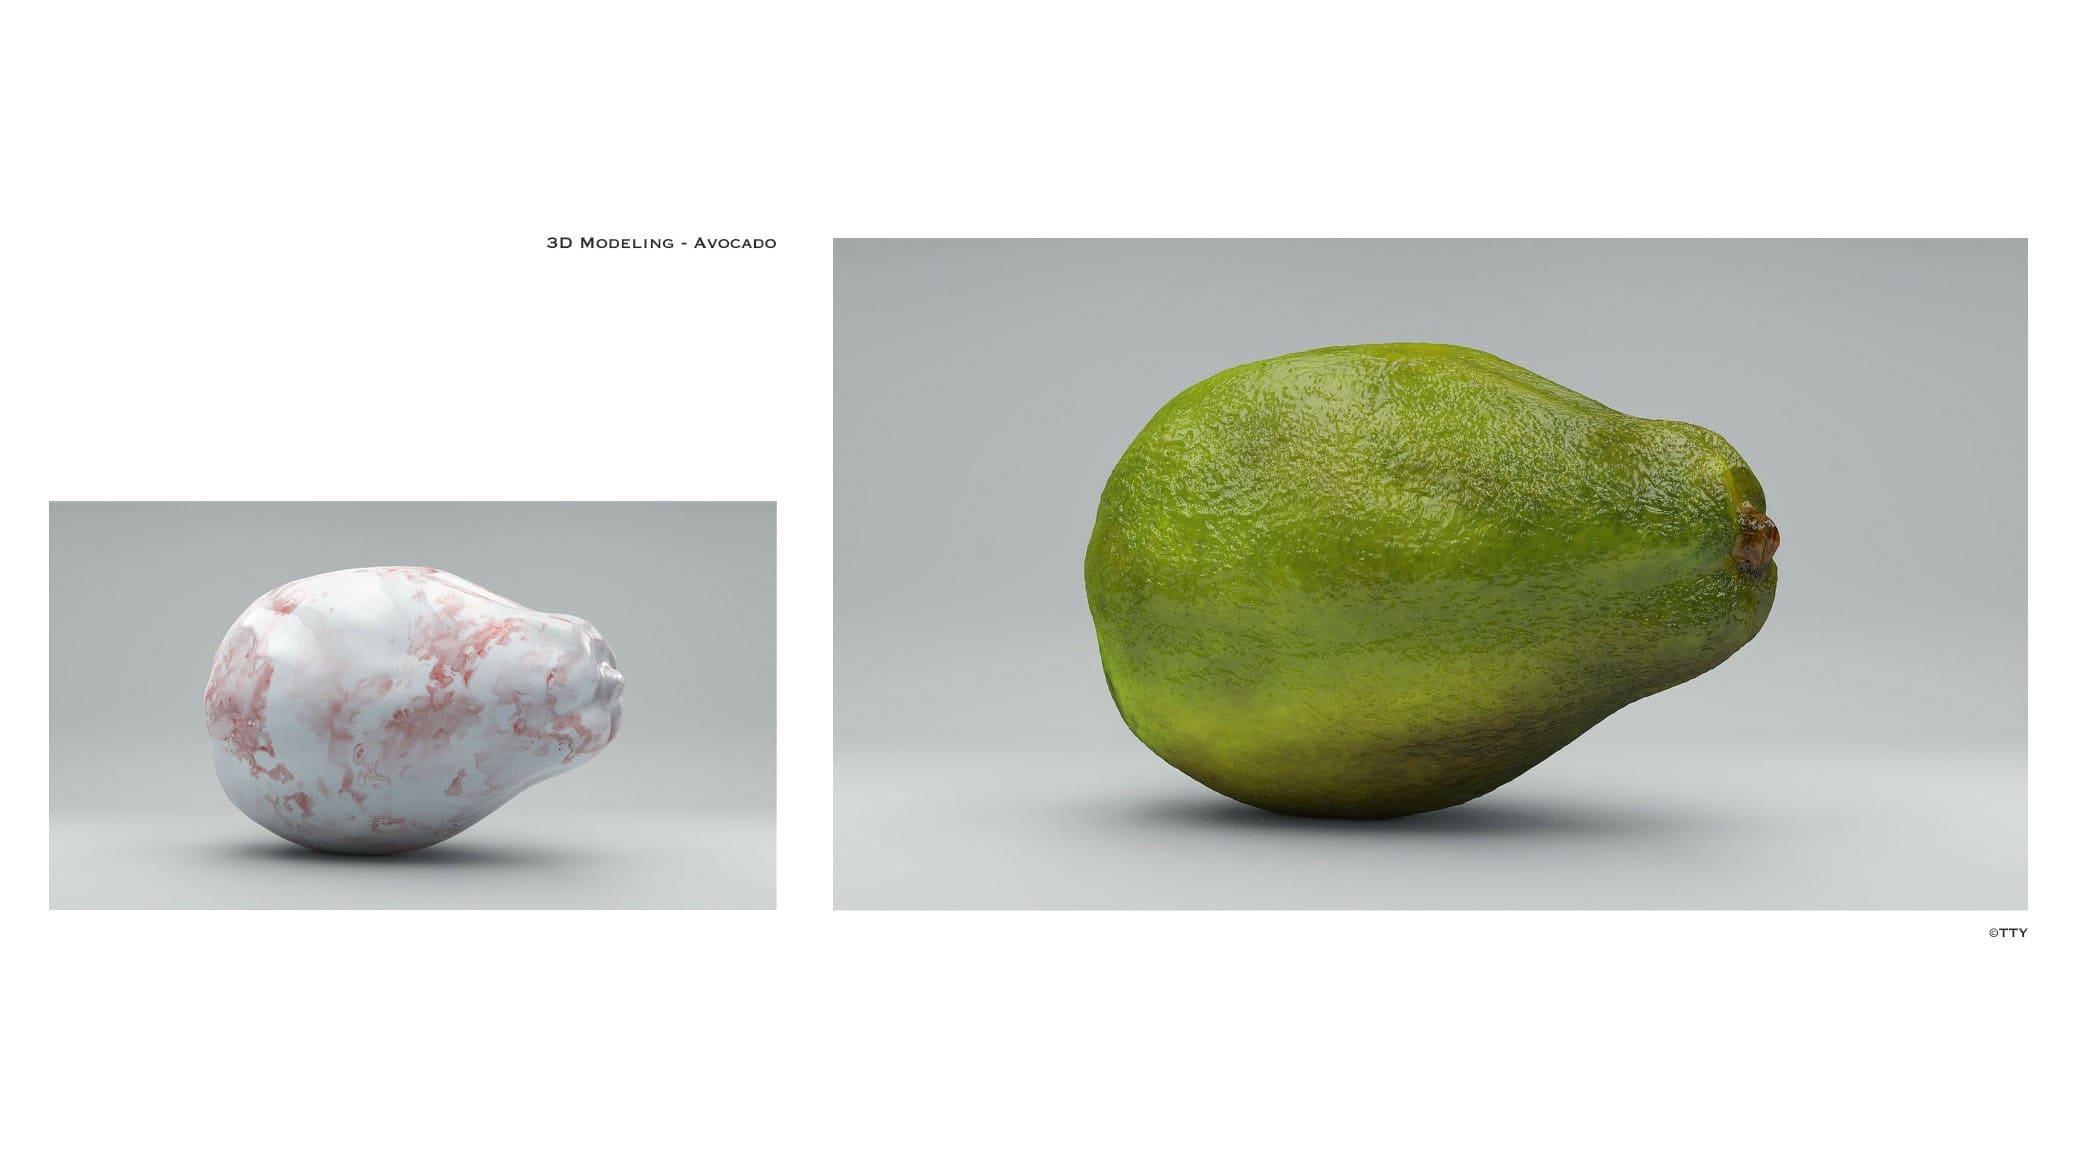 original_TTY-3D-Modeling-Avocado.jpg